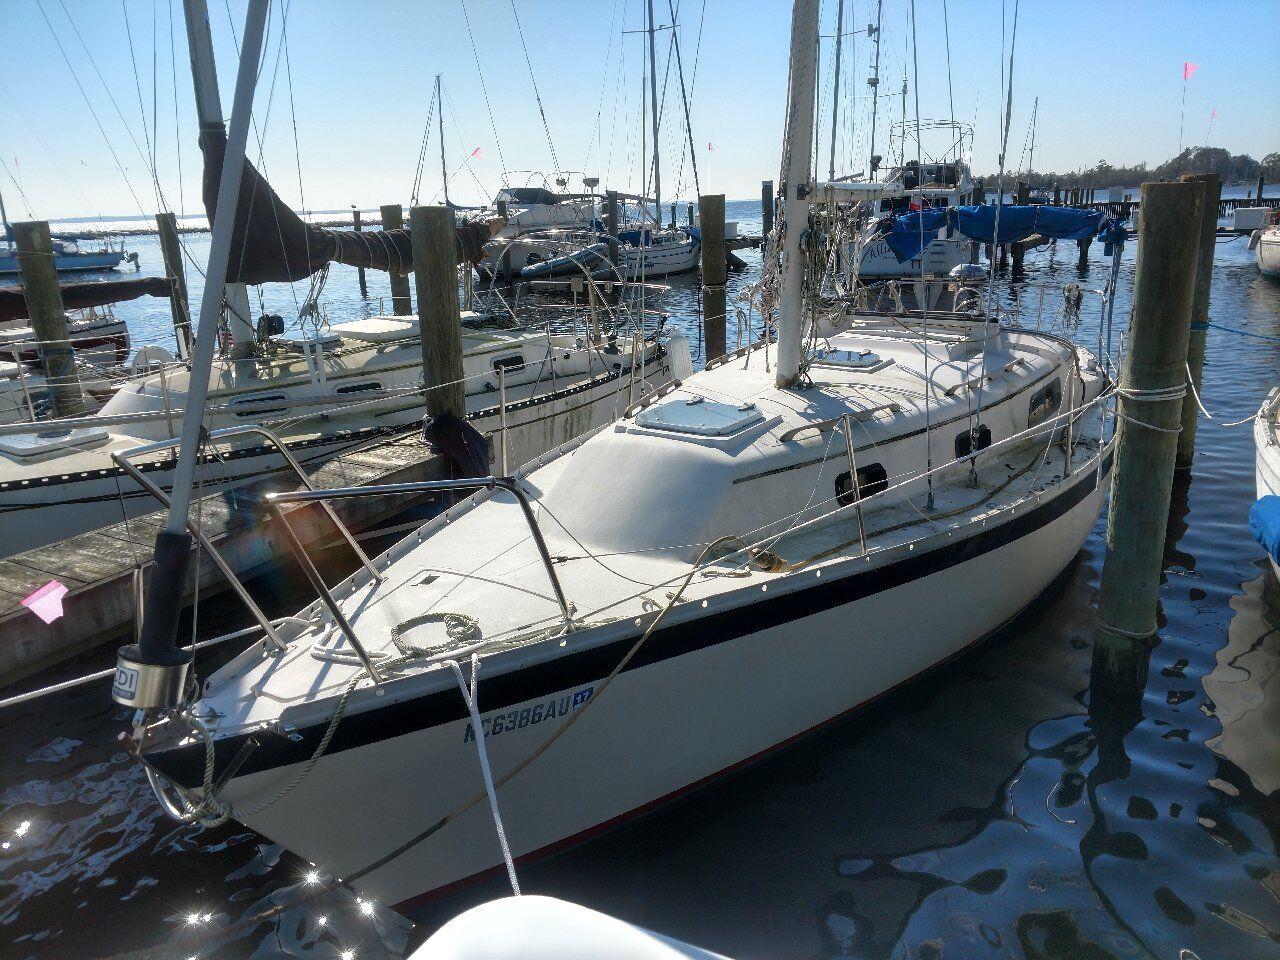 1981 Irwin Citation 30' Sailboat - North Carolina